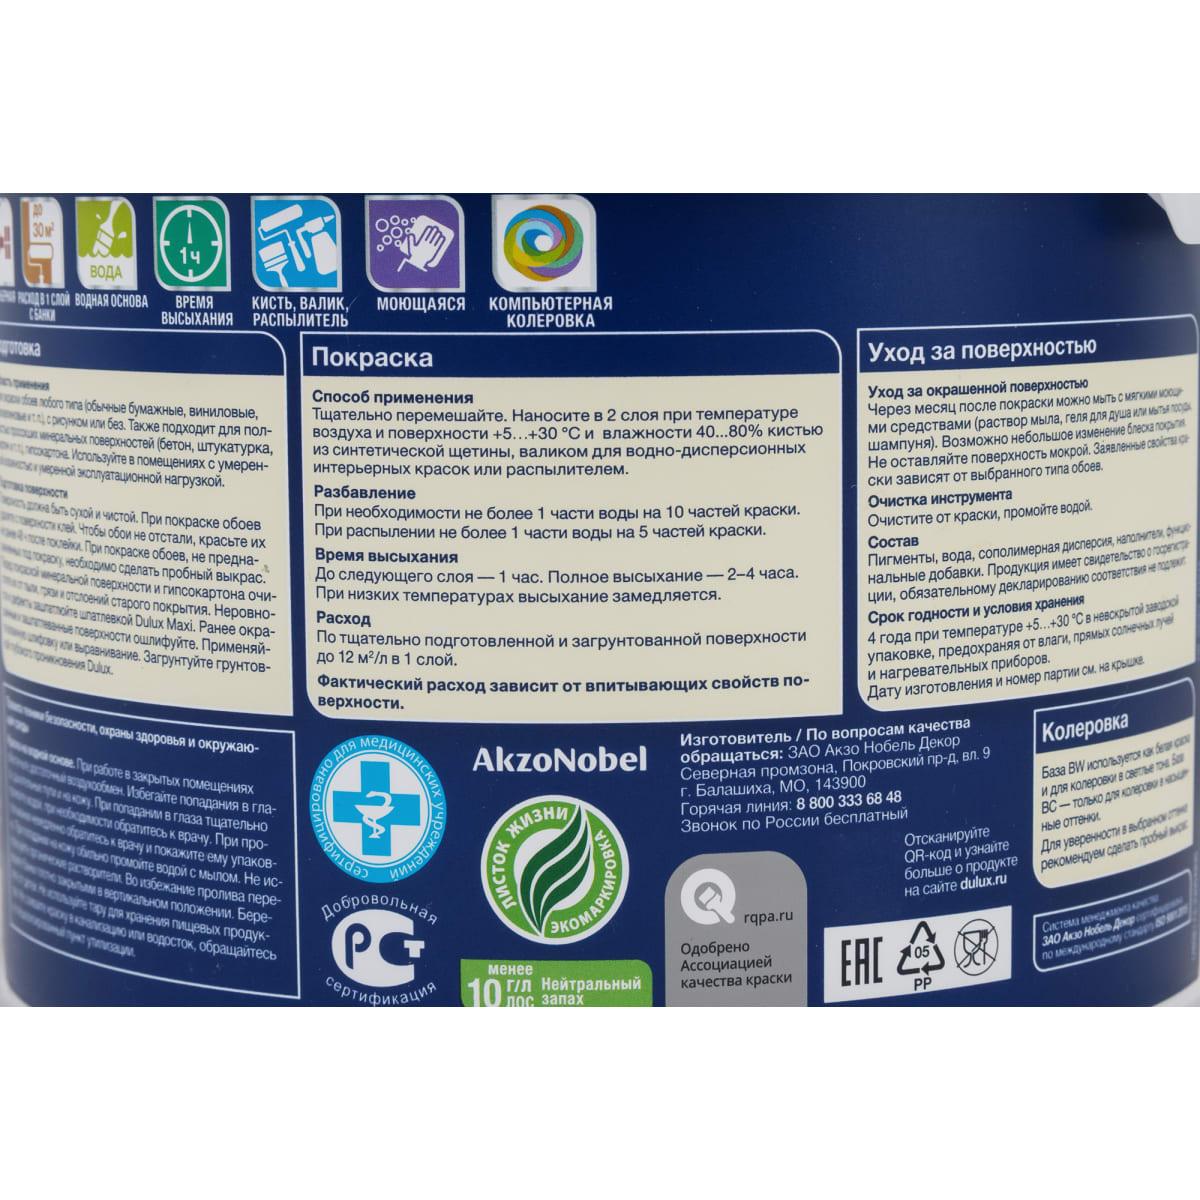 краска dulux для обоев под покраску